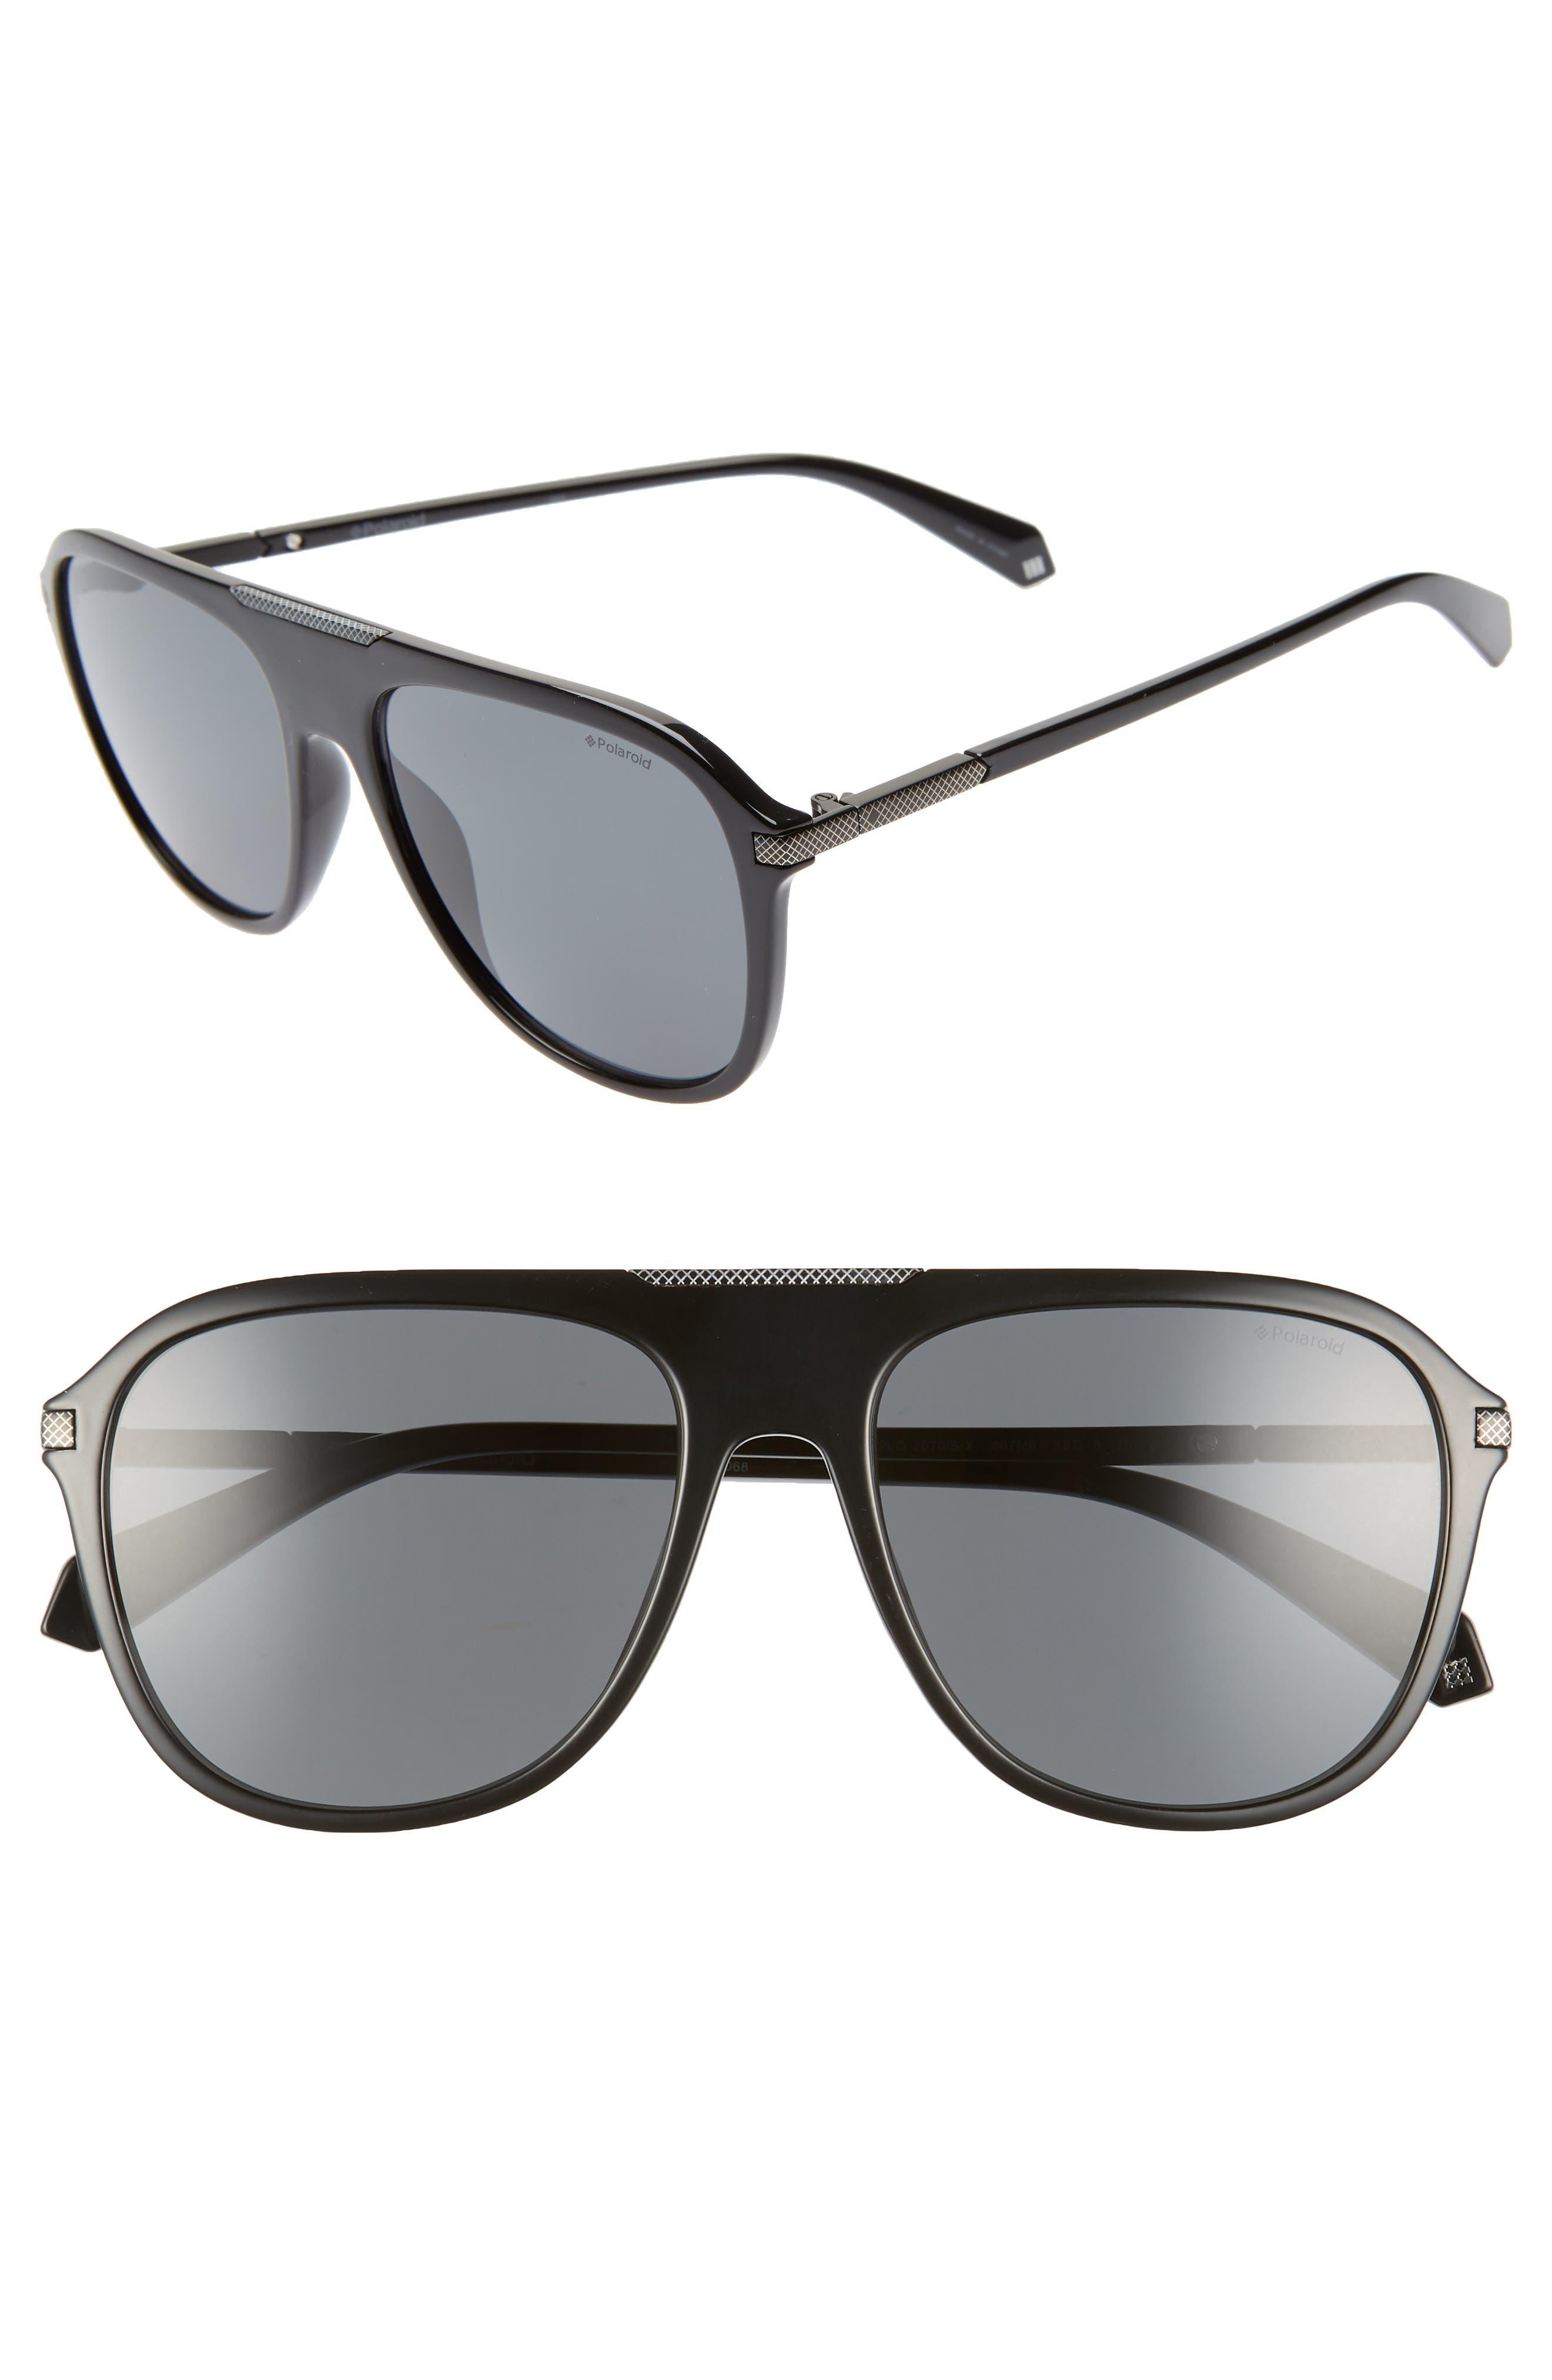 58mm Polarized Aviator Sunglasses,                             Main thumbnail 1, color,                             BLACK